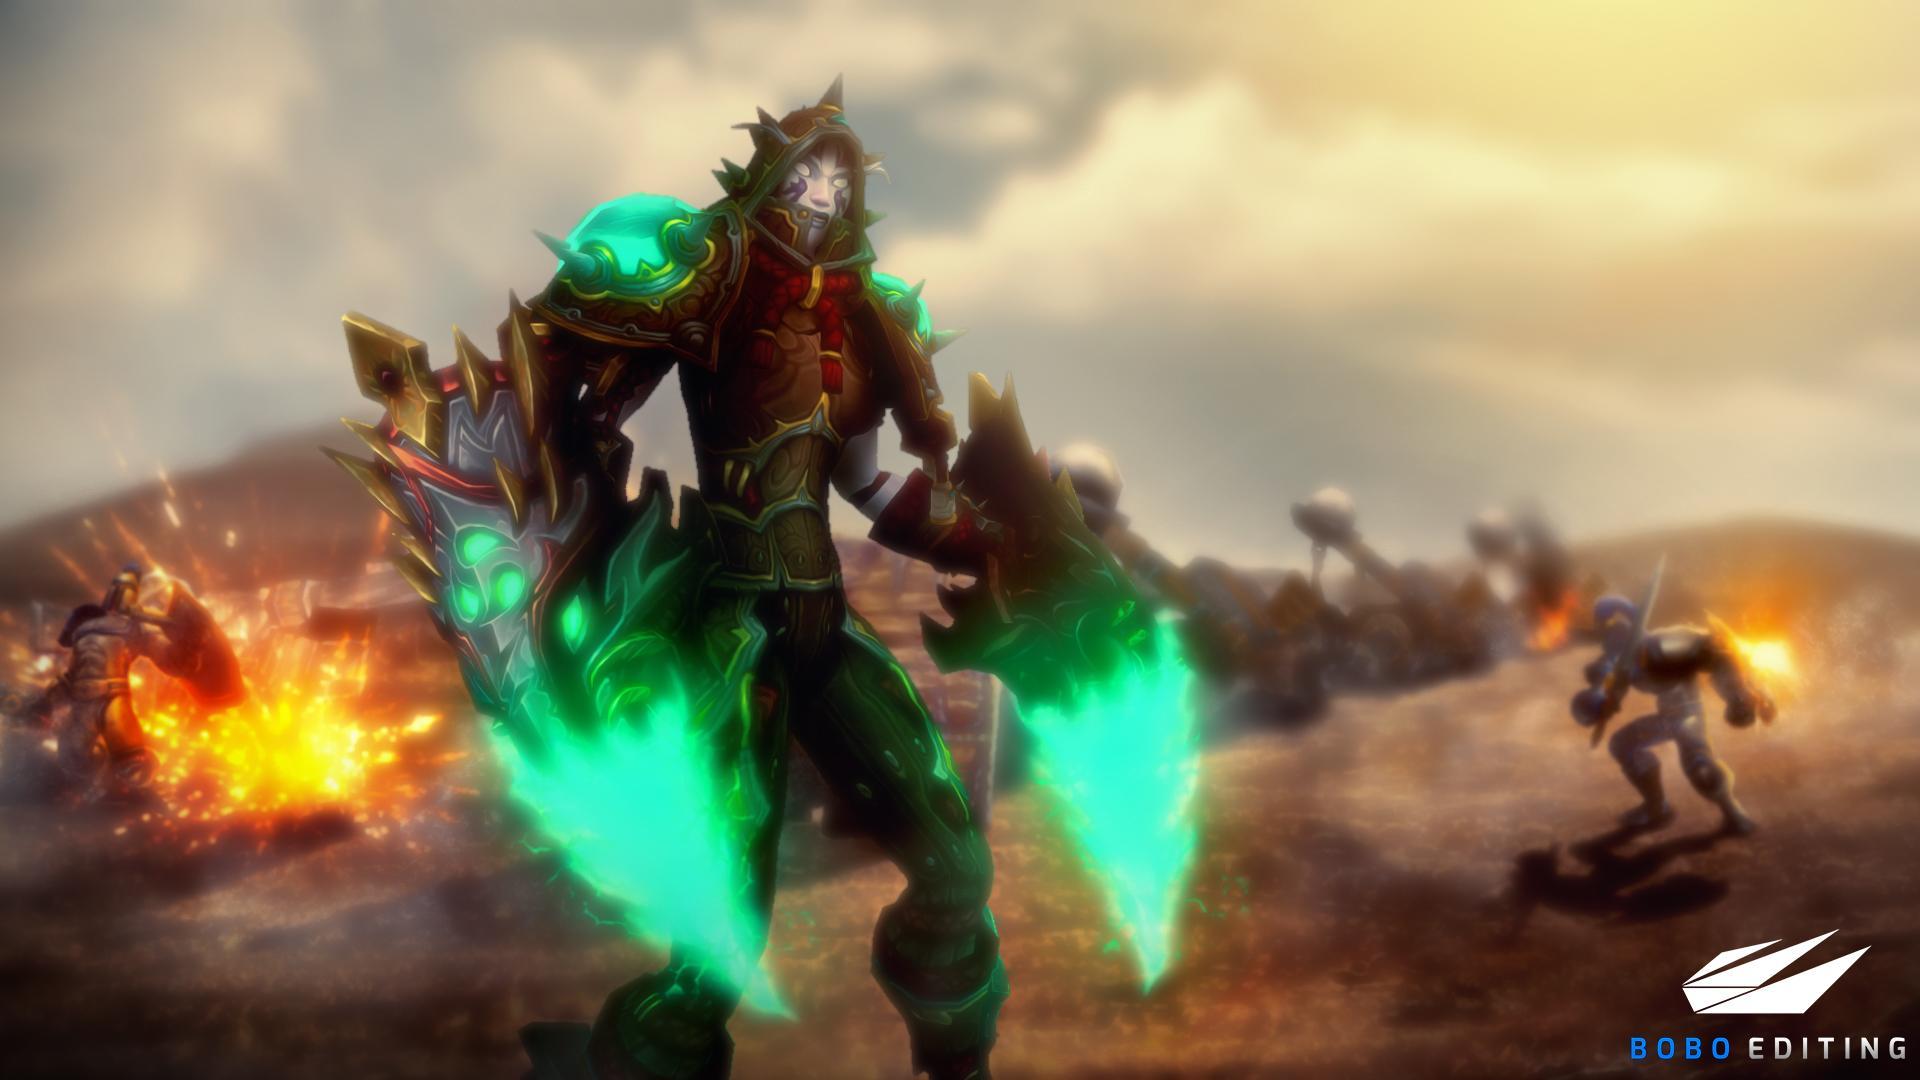 Bfa Hd Wallpaper: World Of Warcraft Battle Of Azeroth Wallpapers